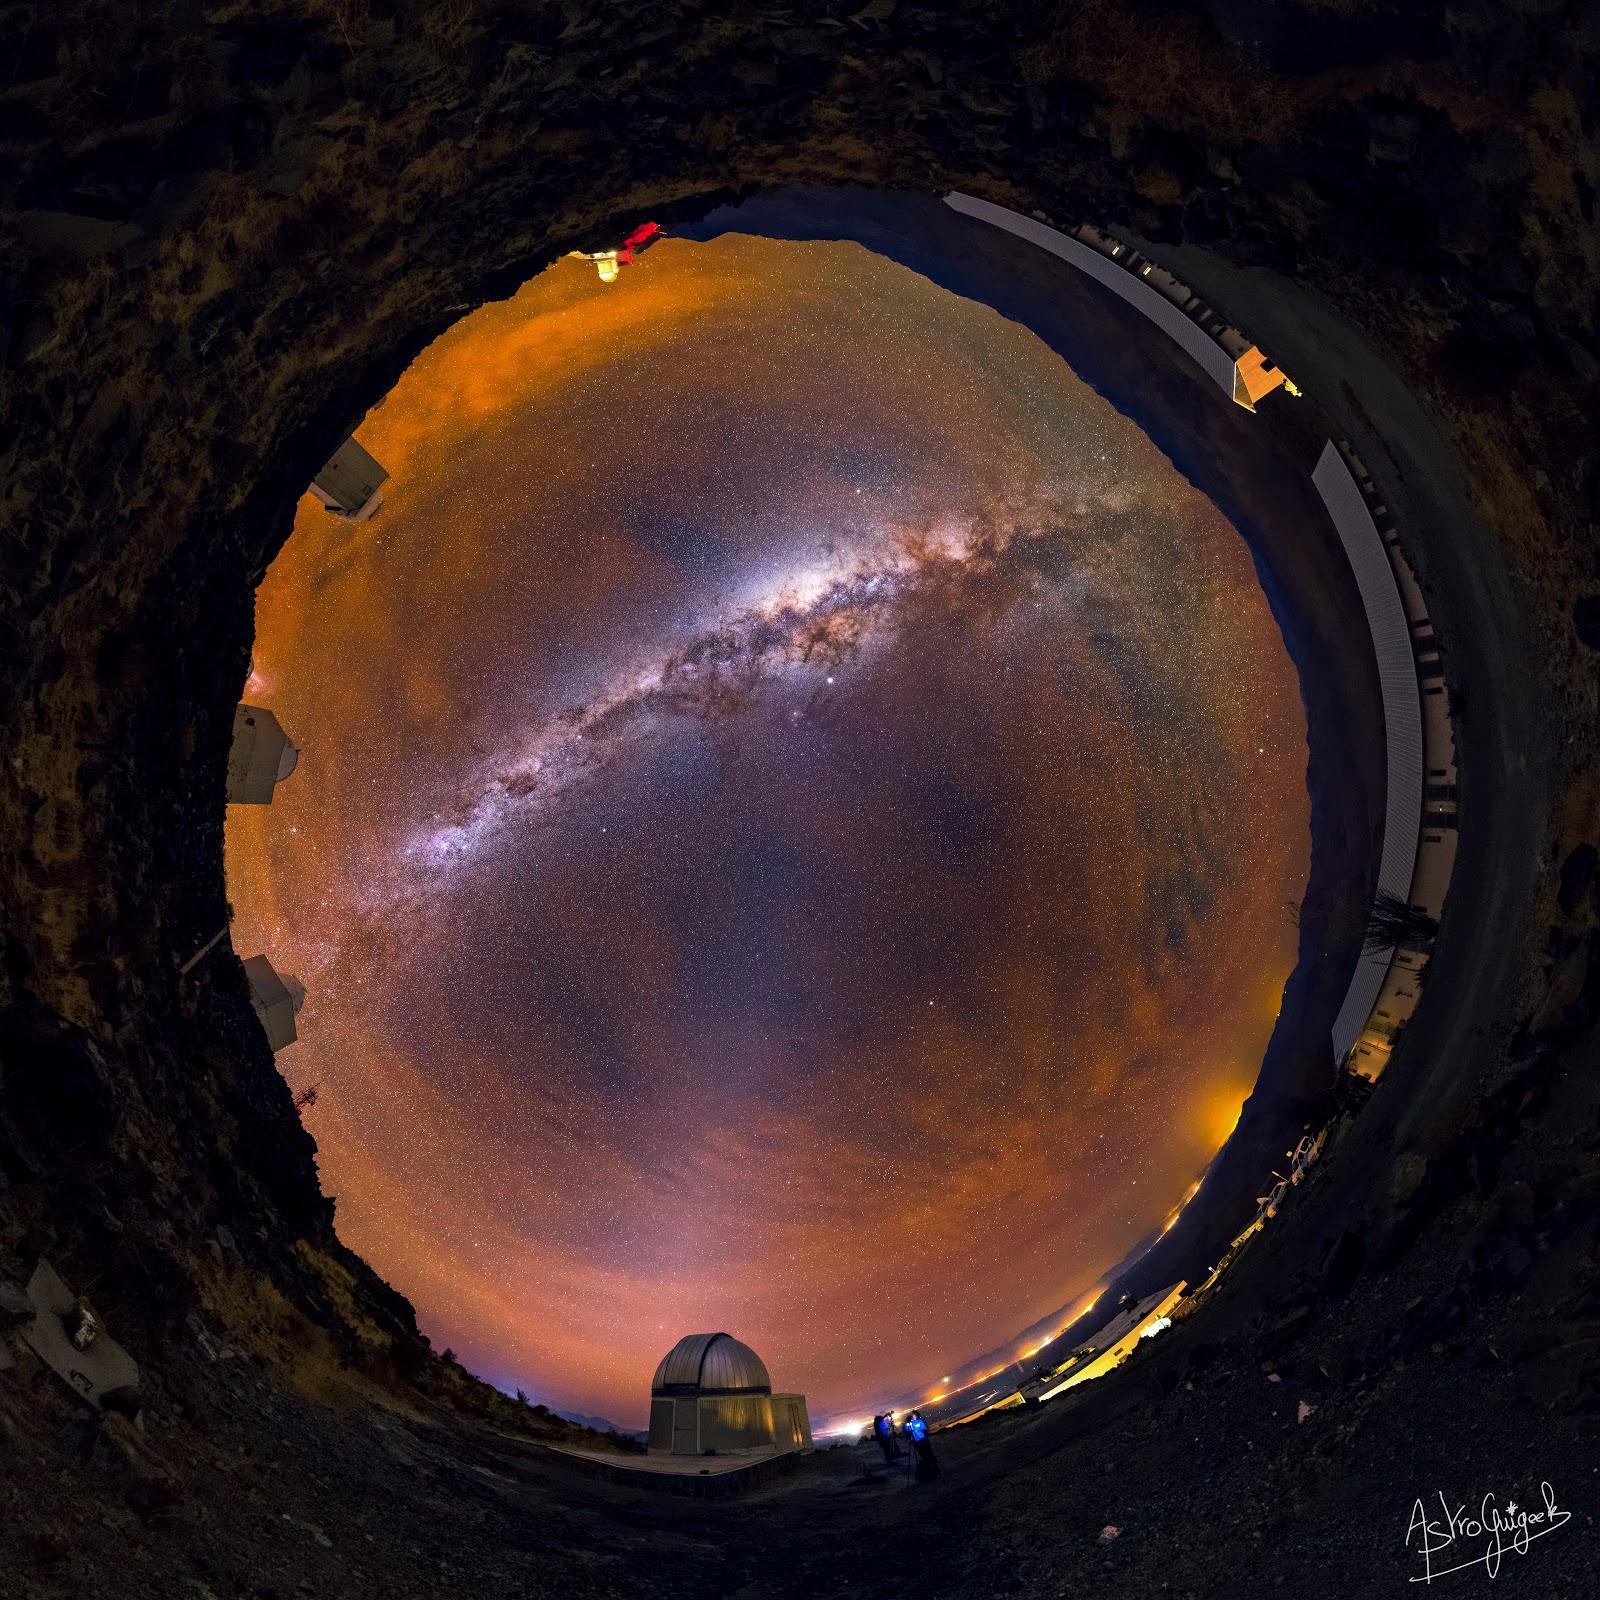 L'extraordinaire ciel étoilé de l'Observatoire de La Silla en 360°